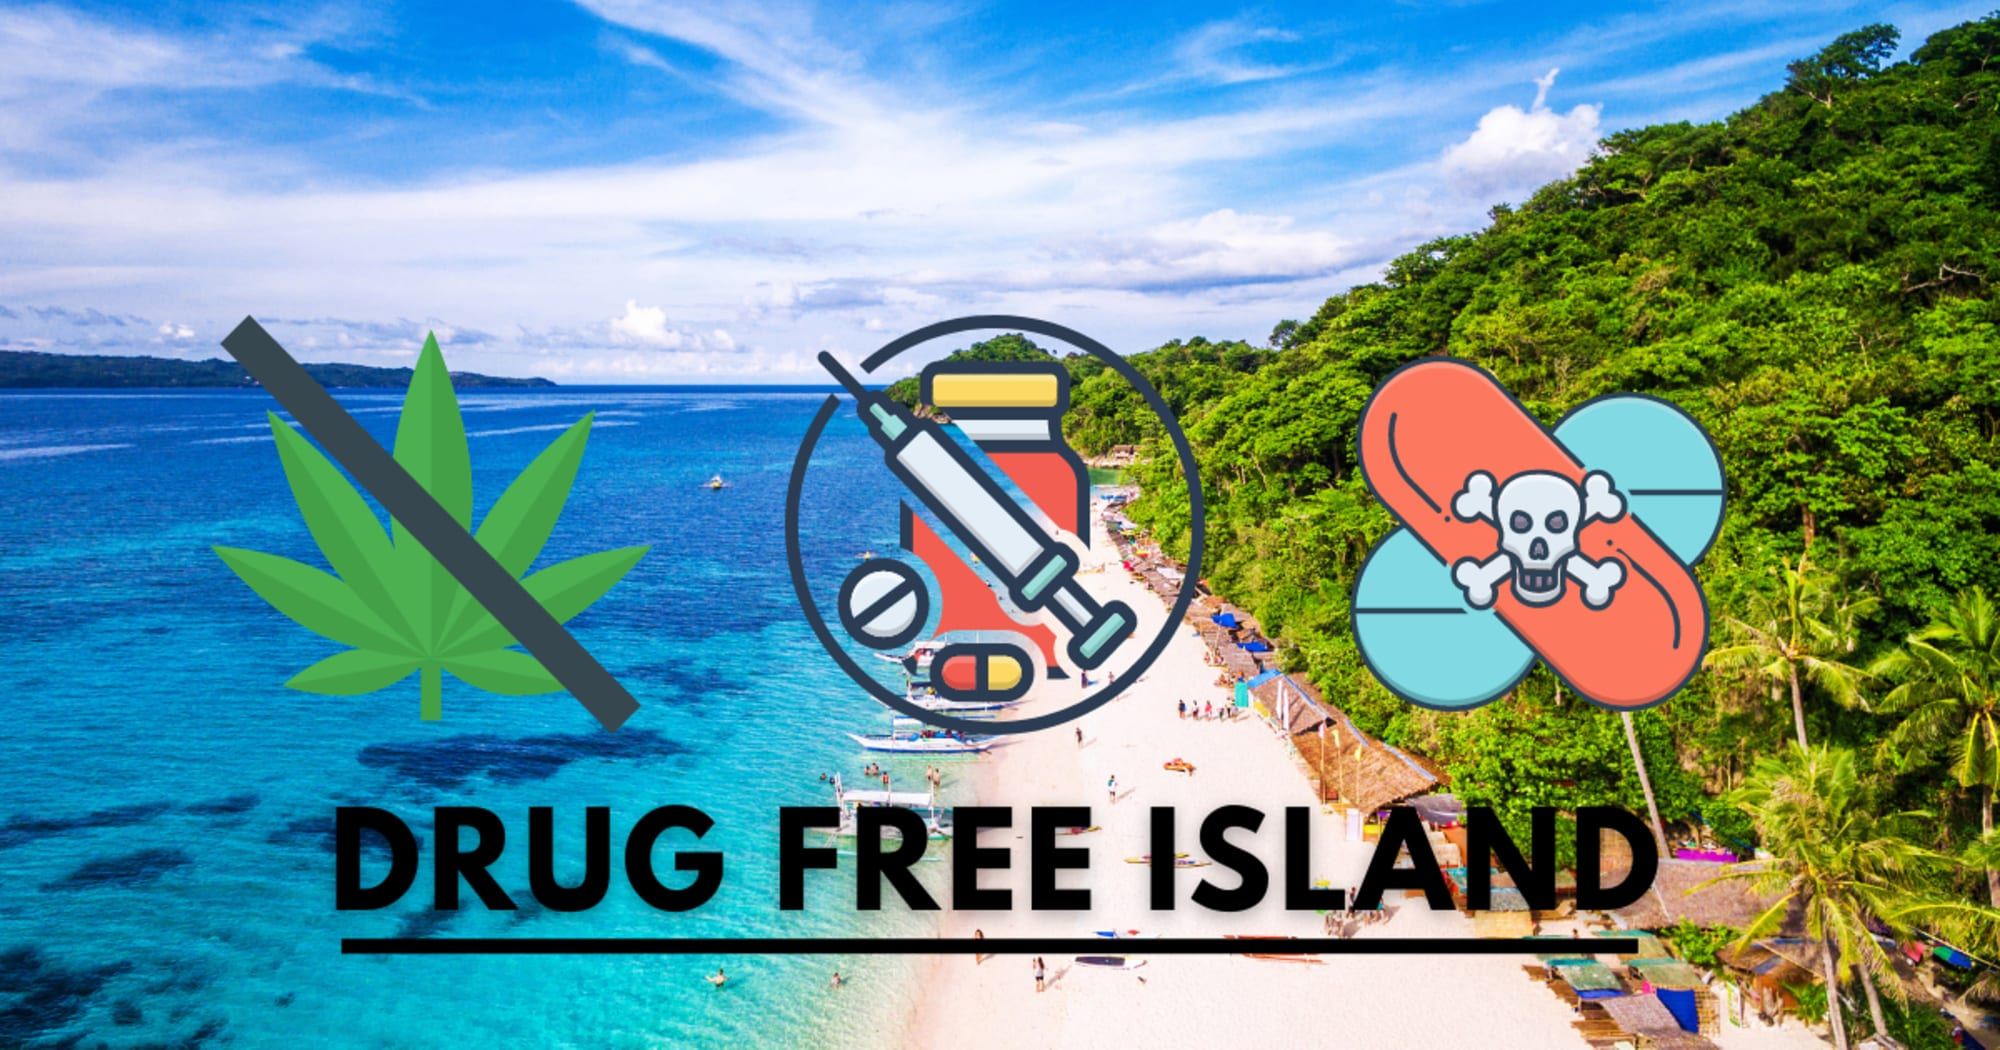 Boracay Island now a drug-free tourist destination